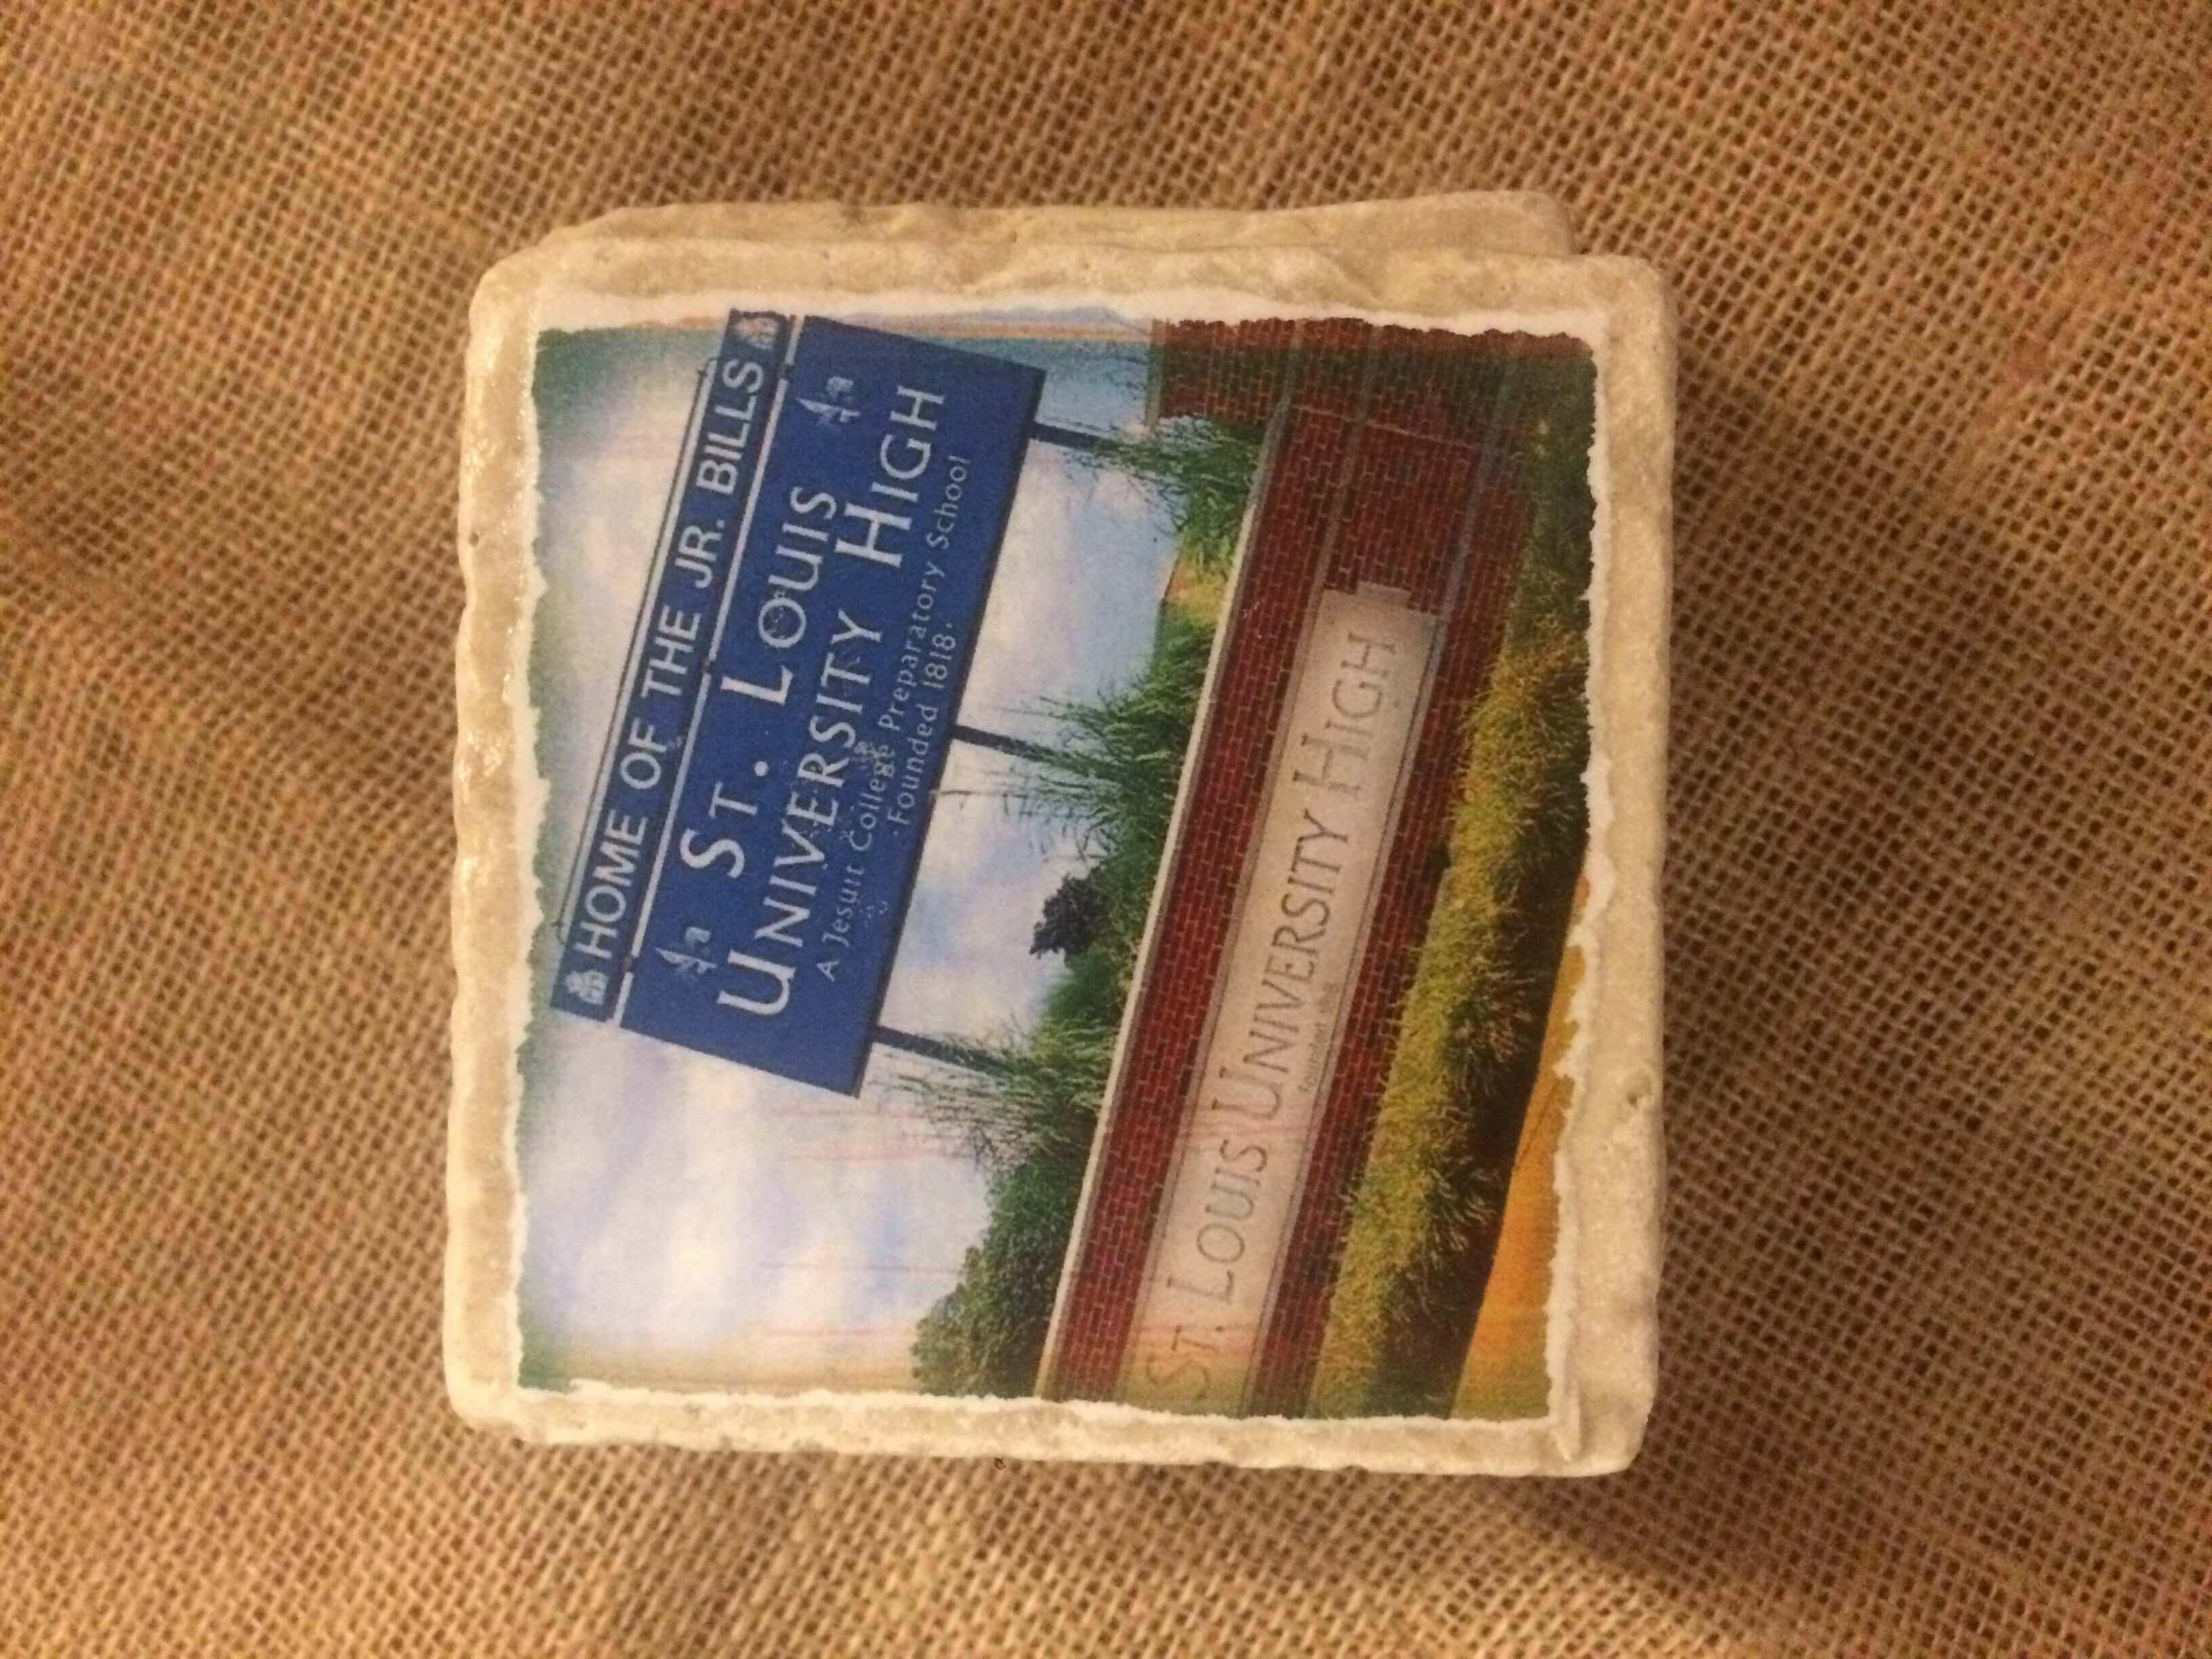 St. Louis Coasters